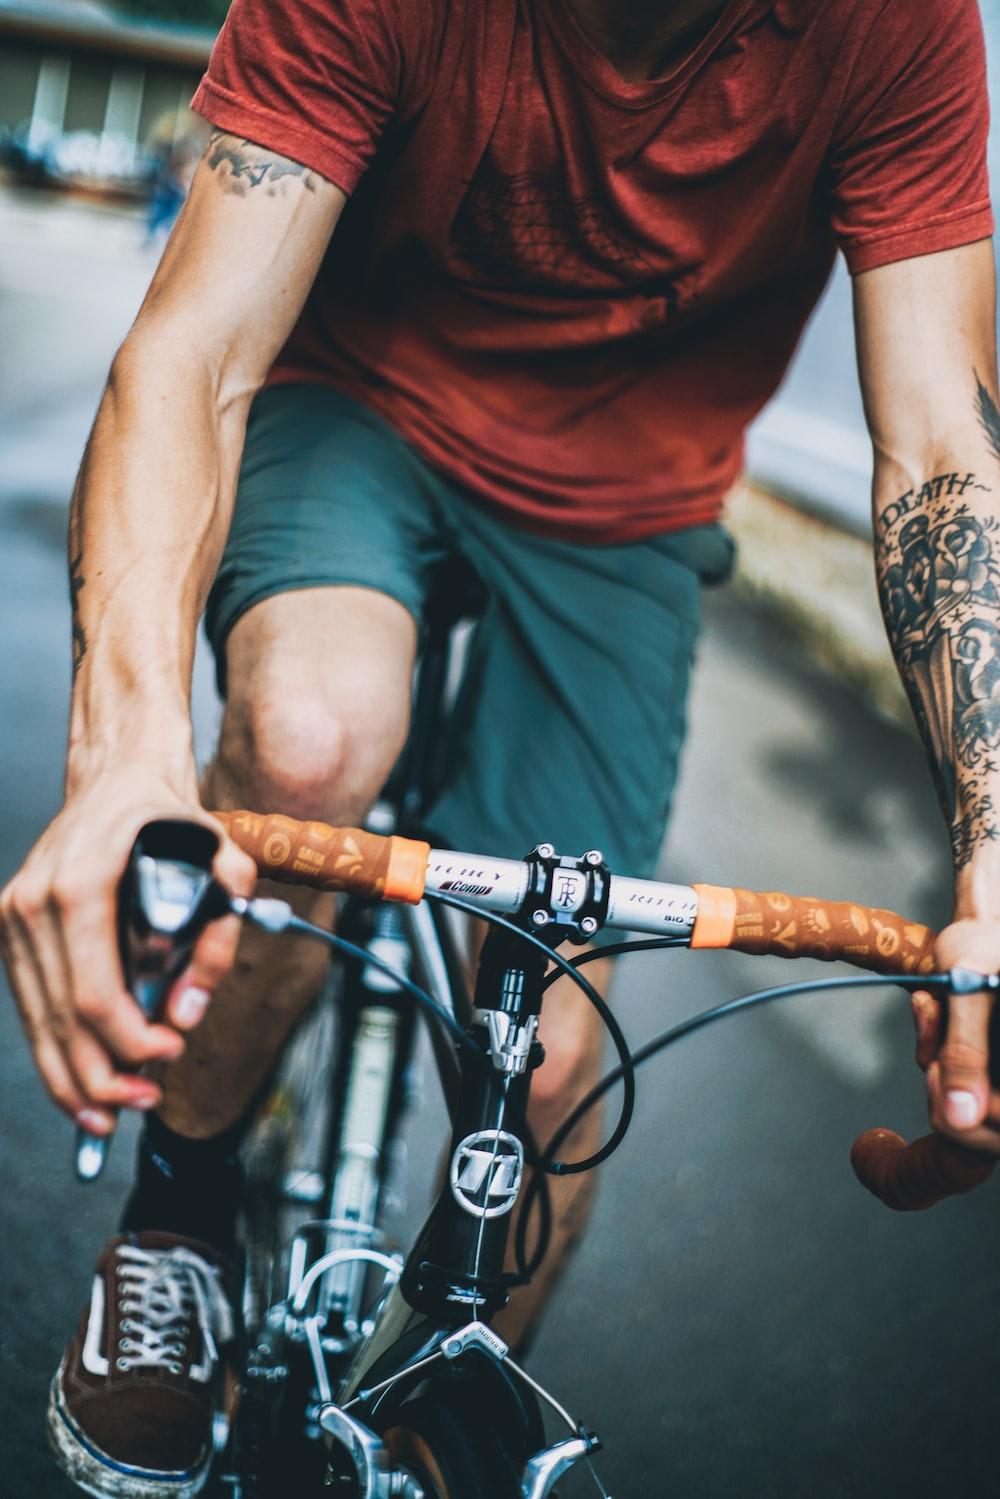 man riding black and gray bicycle photo